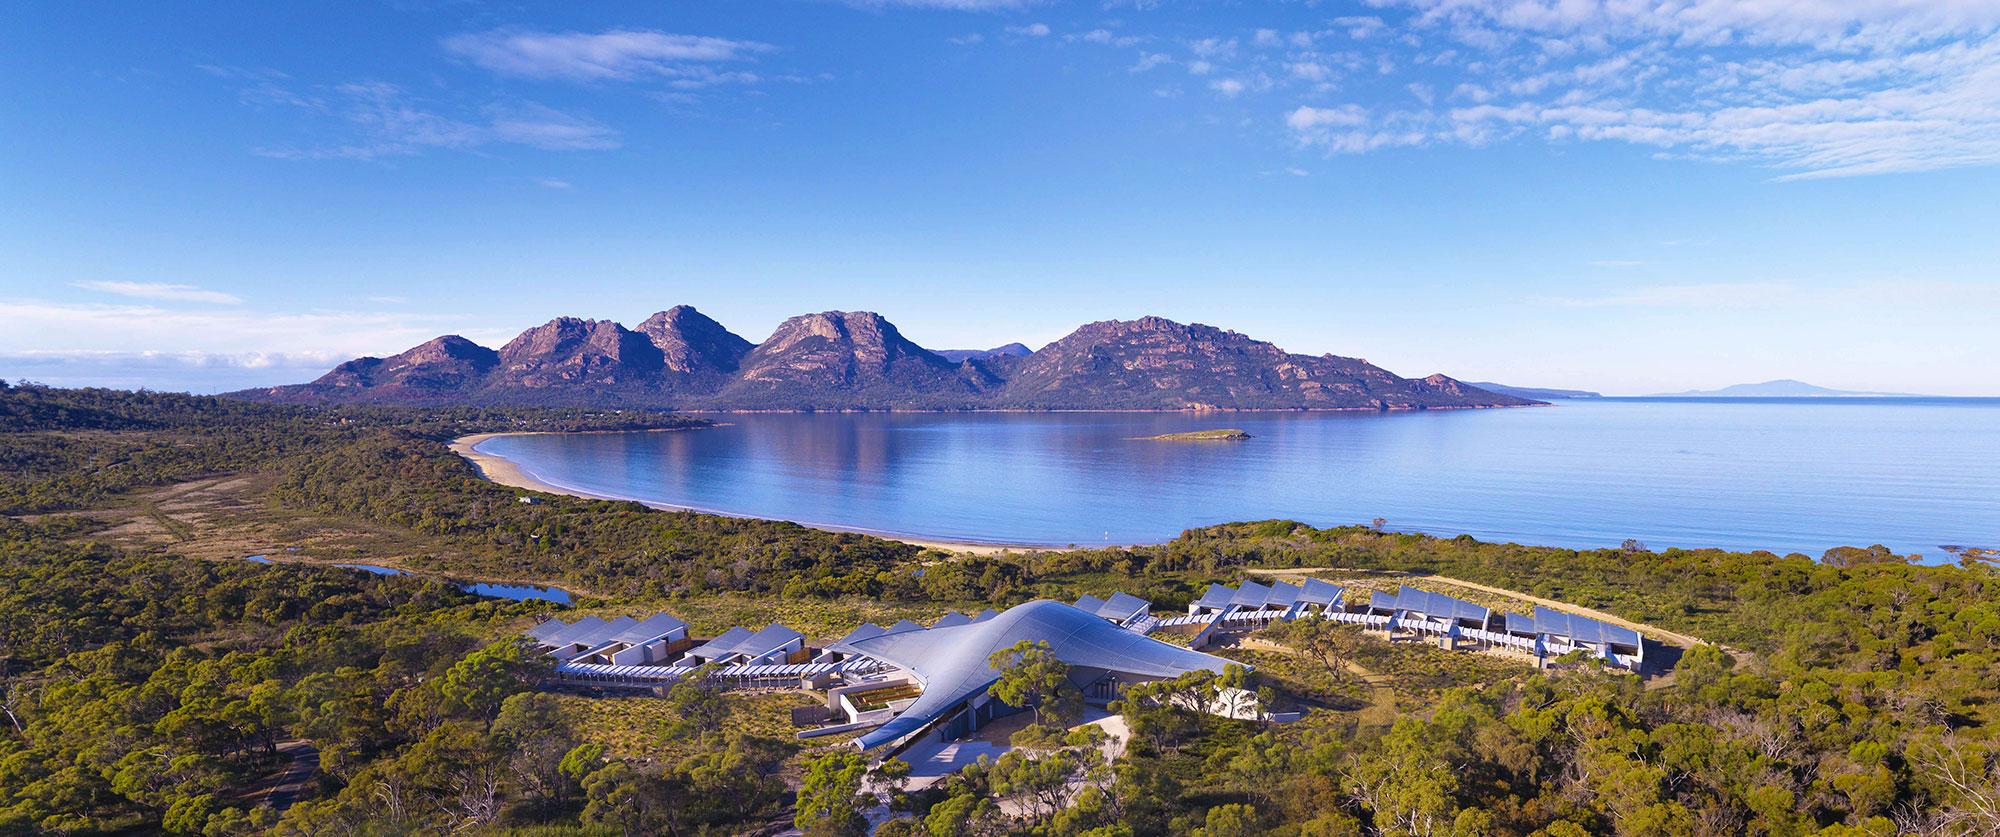 D113-hero-australia-saffire-freycinet-aerial-tasmania-luxury-lodge-coles-bay-2000x837